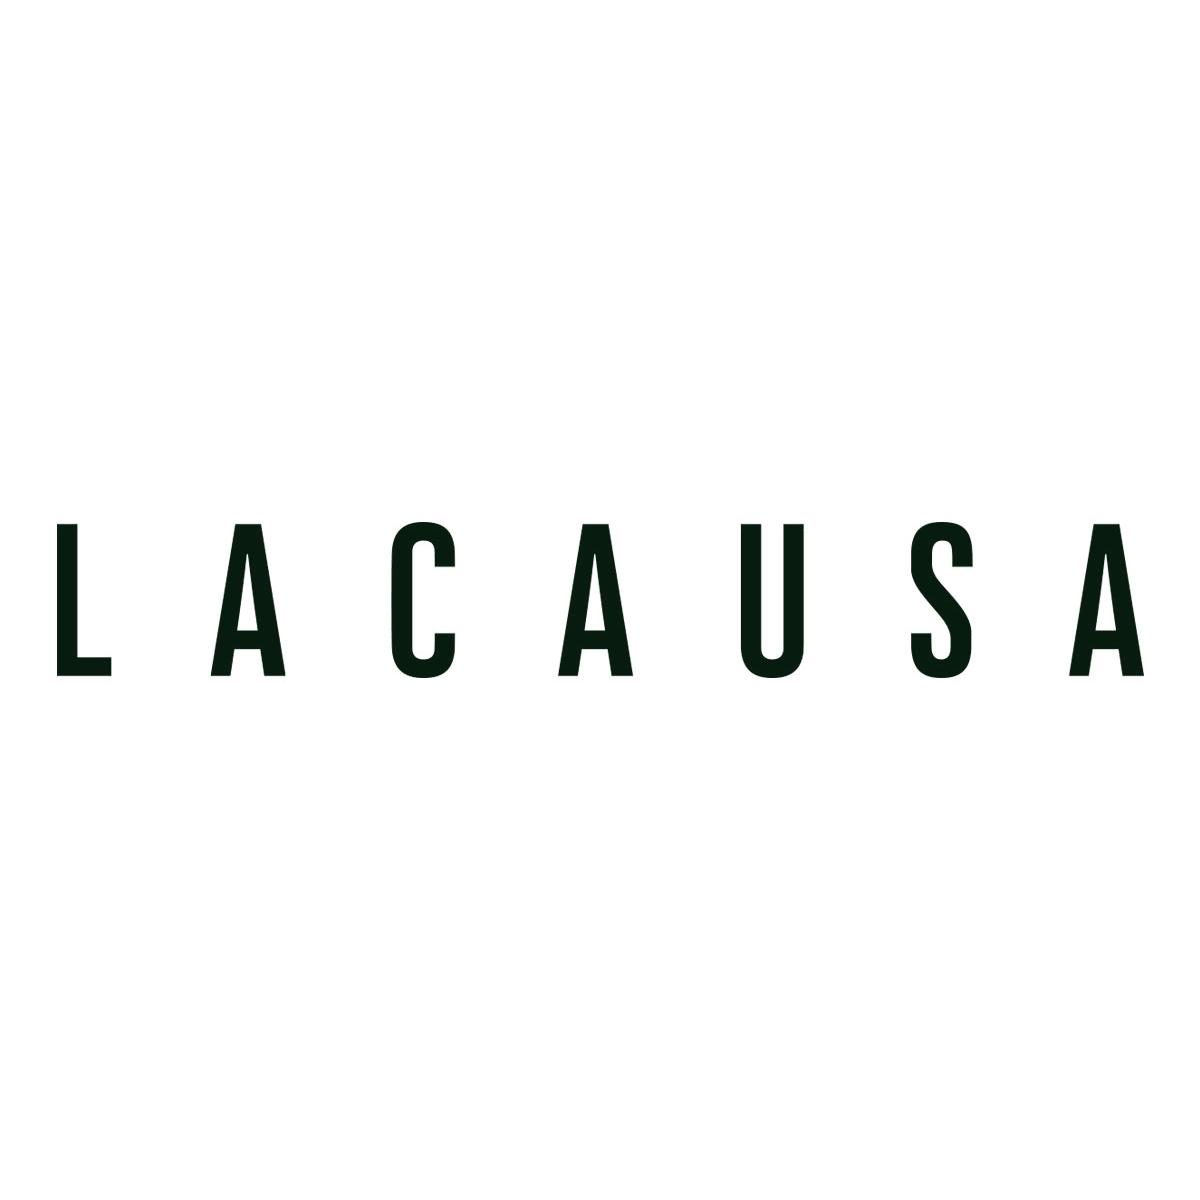 Lacausa Clothing Voucher